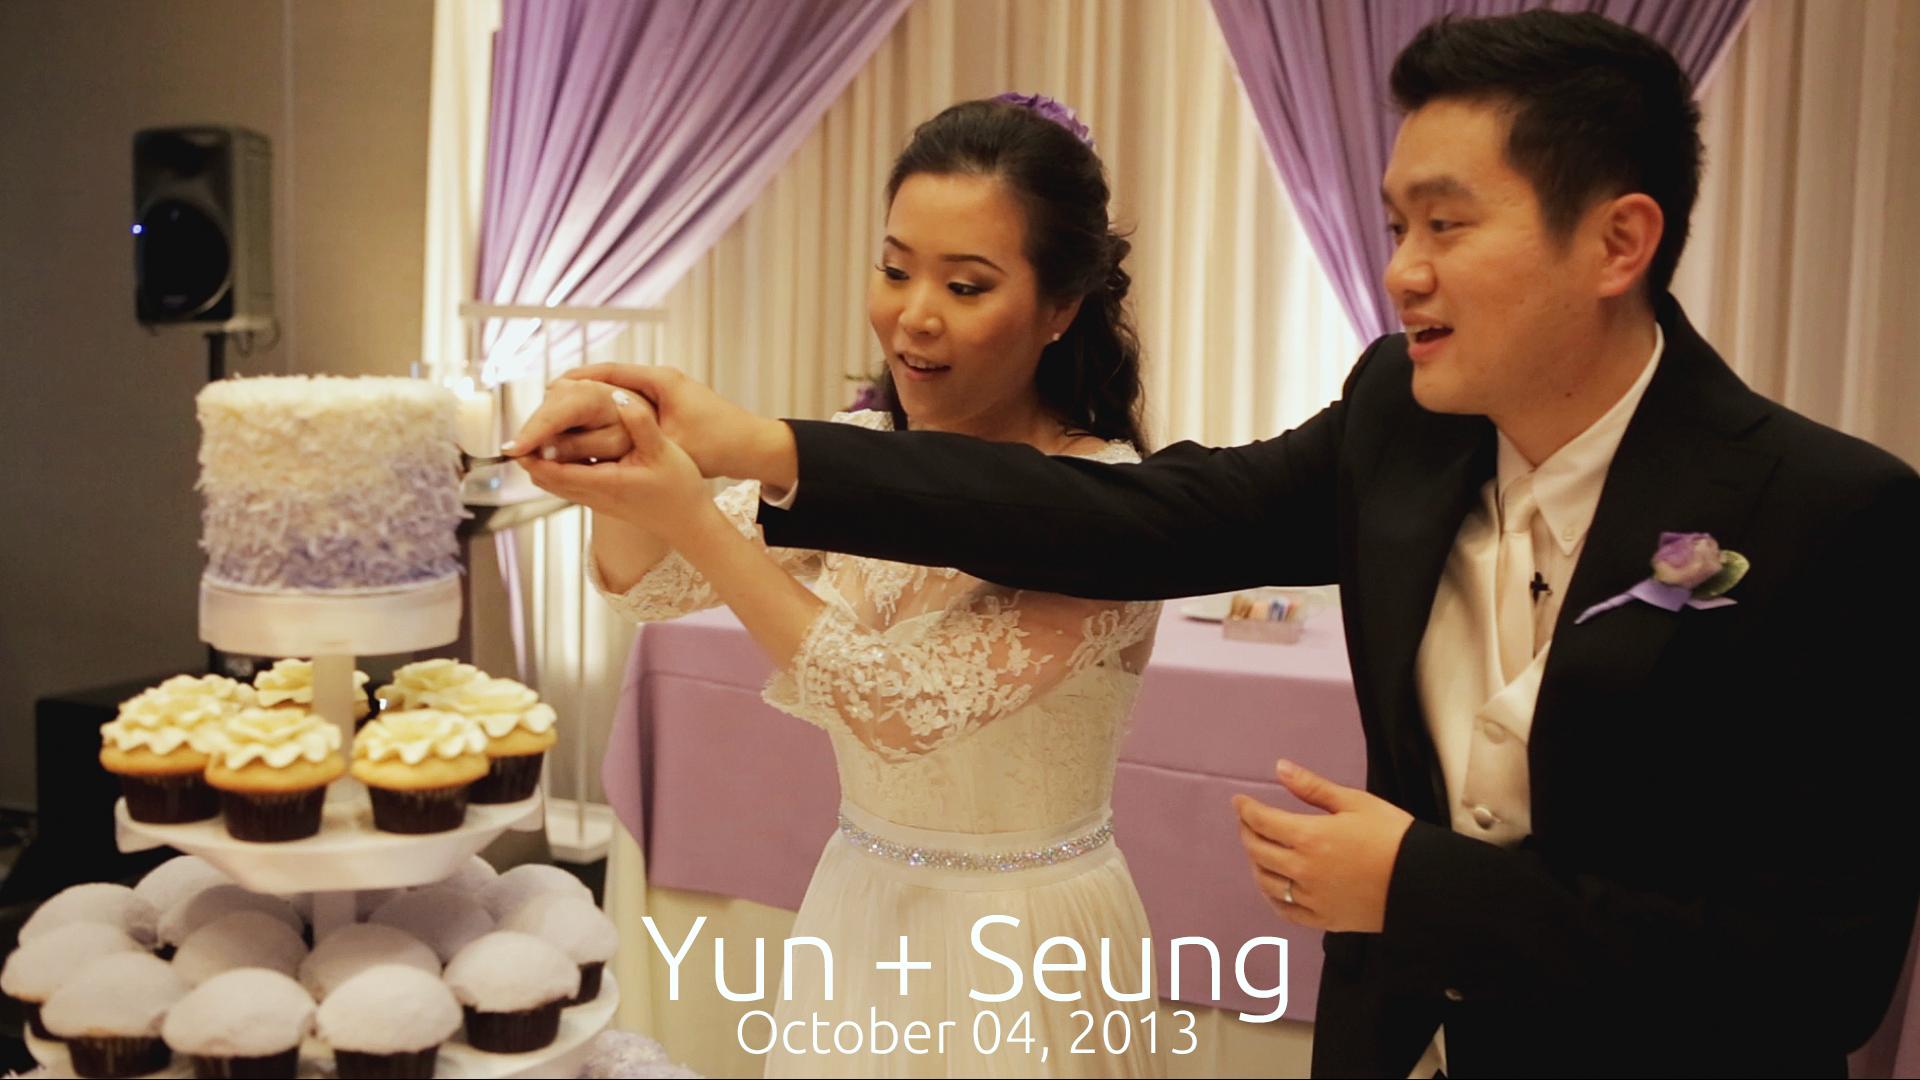 Photo: Yun + Seung - an epiem wedding film  epiem Blog regarding this photo can be found here: http://www.epiem.com/video/wedding-video/item/yunhee-and-seungsu-an-epiem-wedding-film